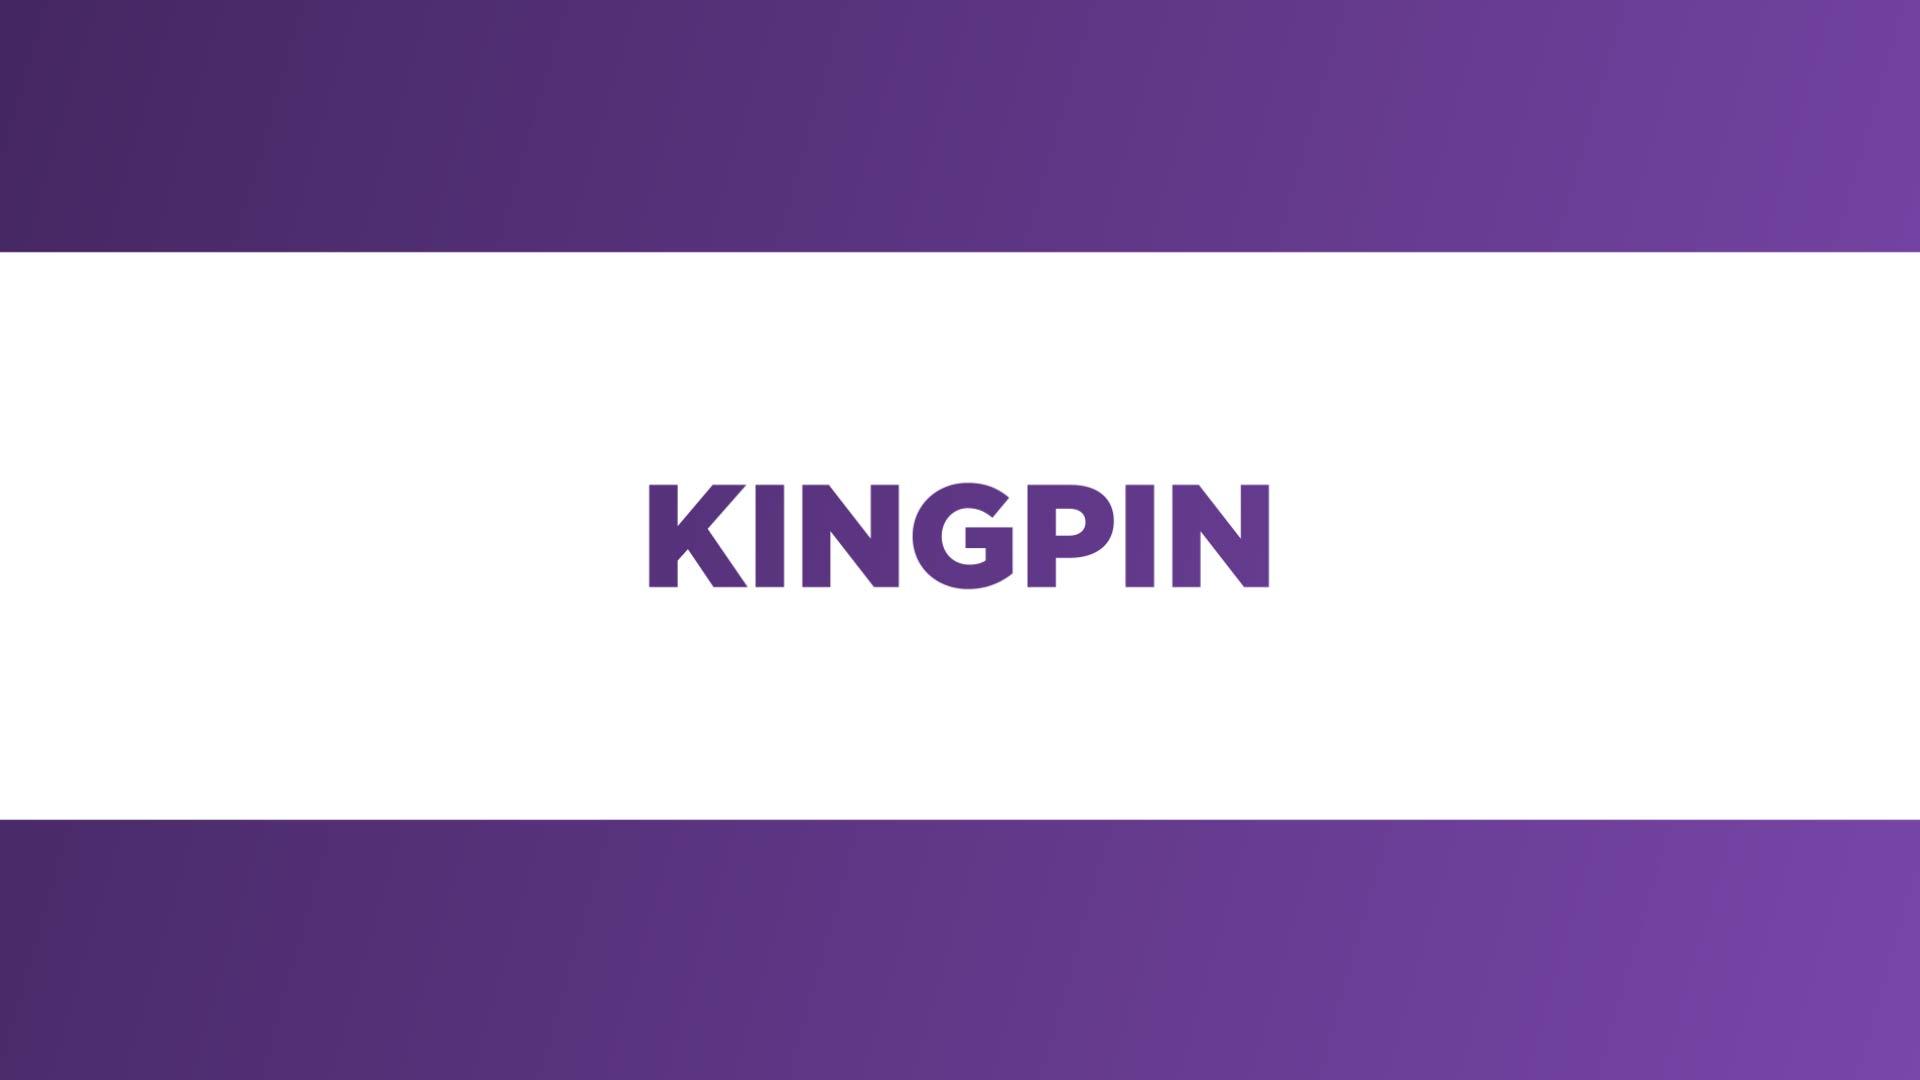 Kingpin (0-00-51-05)